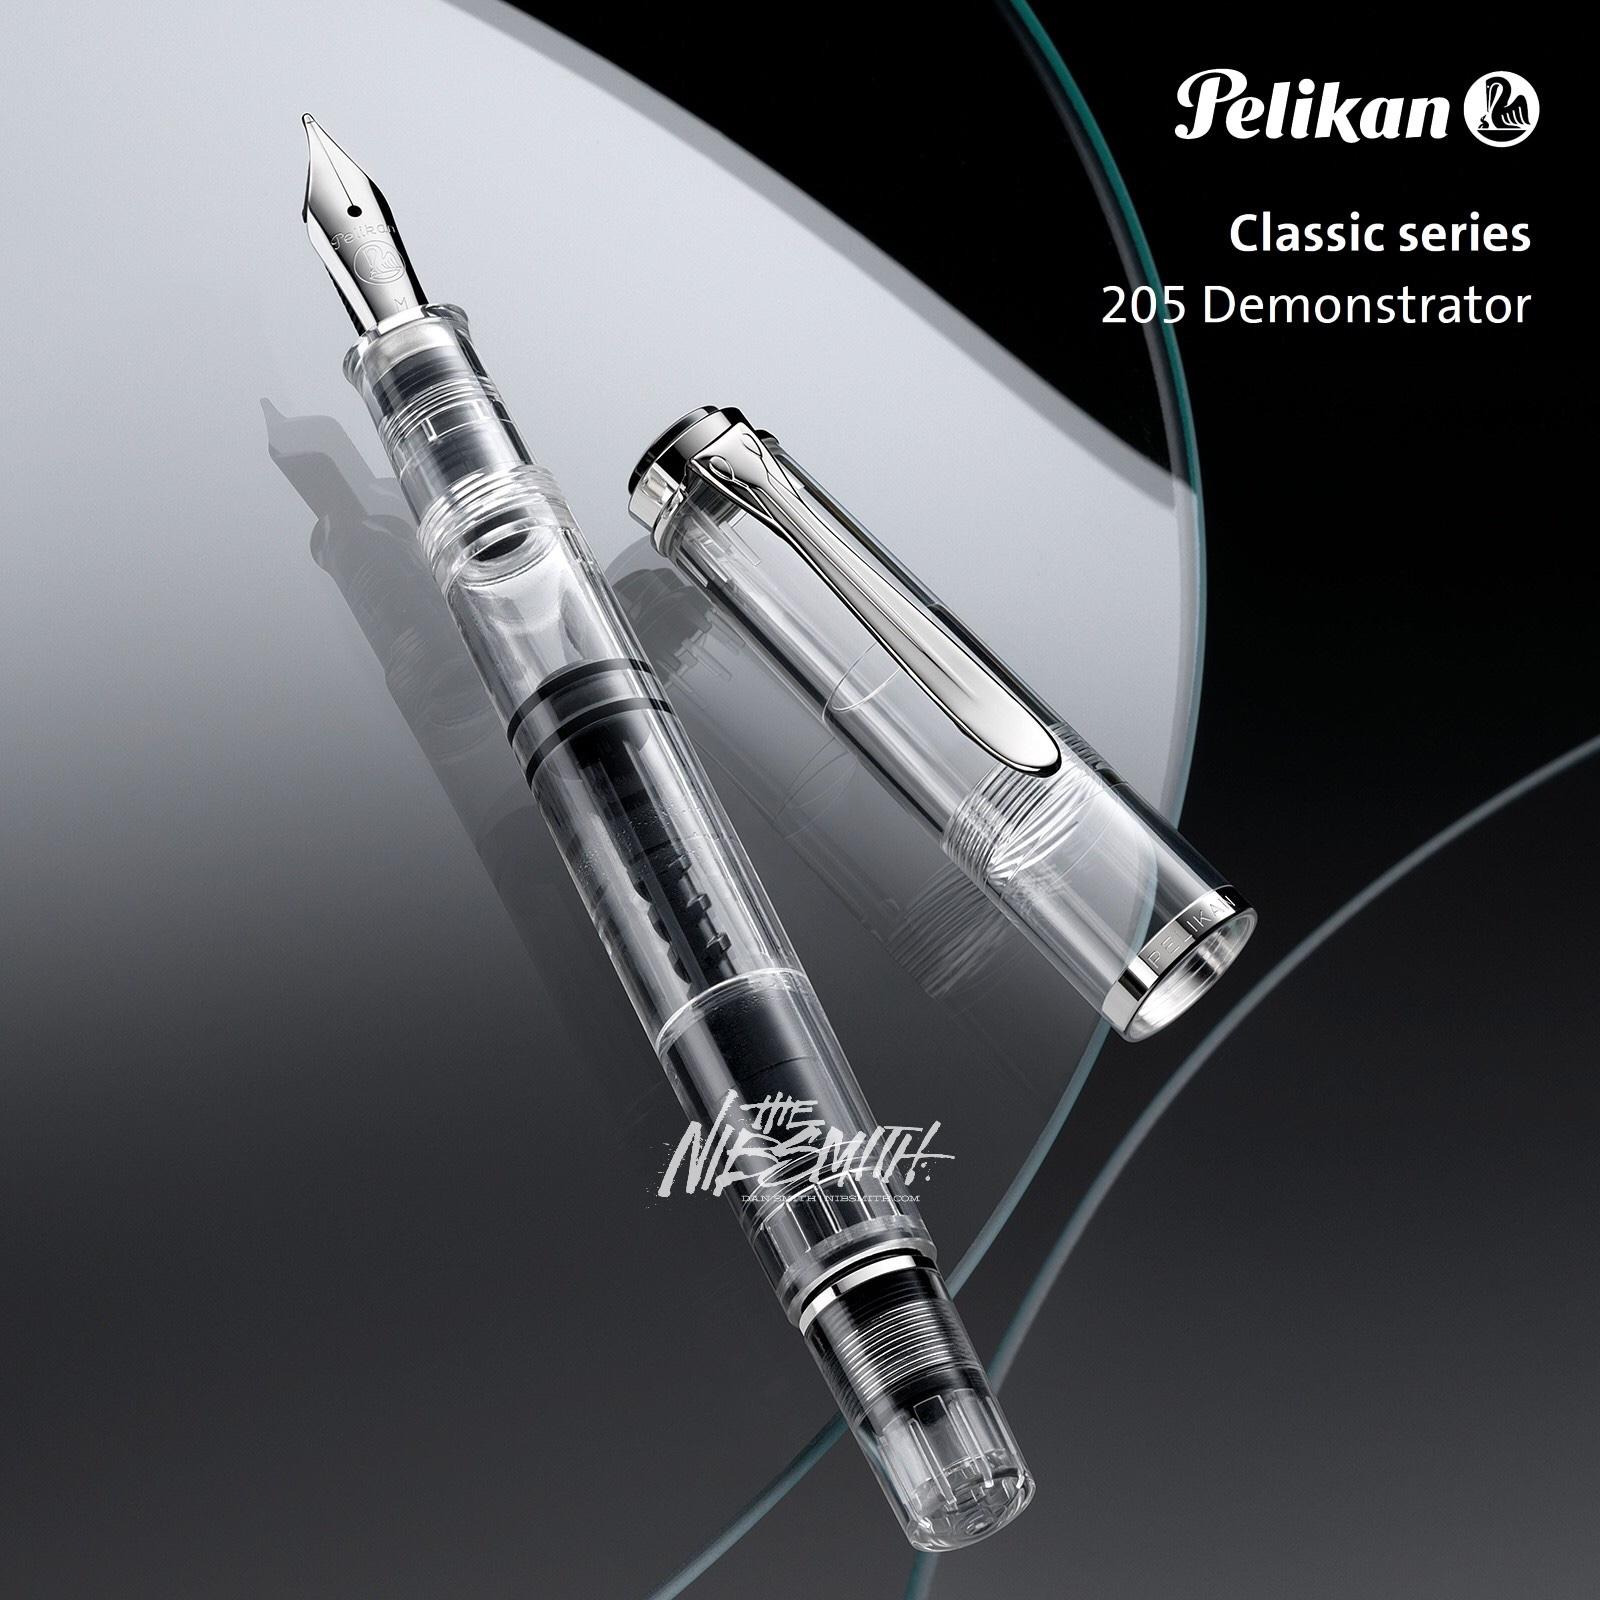 pelikan-classic_m205_demonstrator-fountain-pen-nibsmith-1